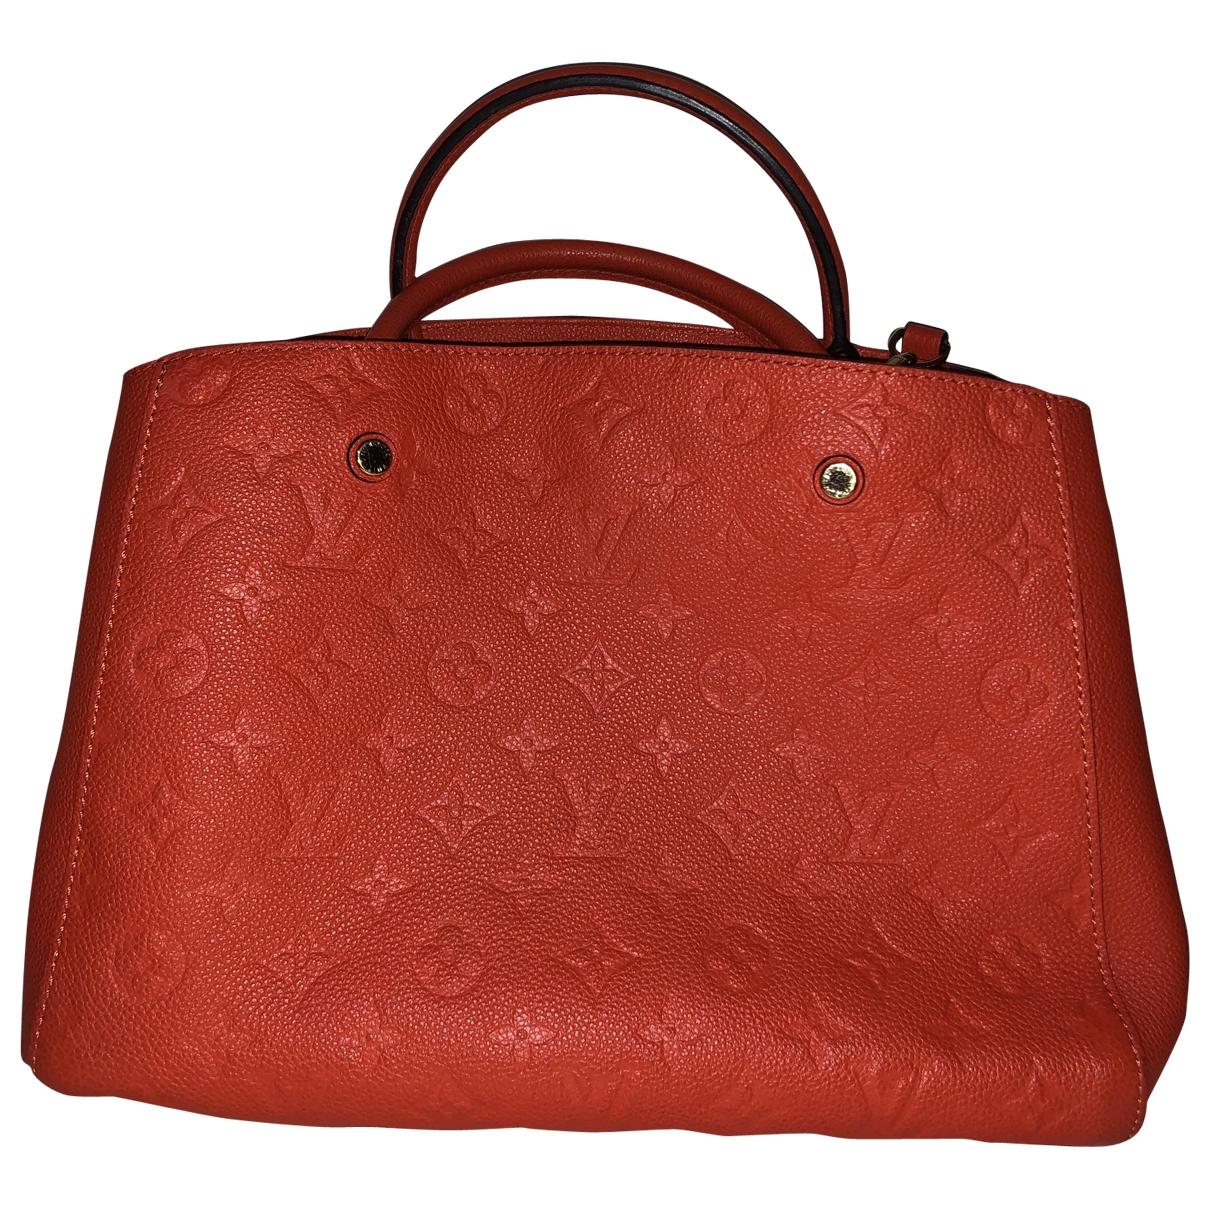 Louis Vuitton Montaigne Orange Leather handbag for Women \N